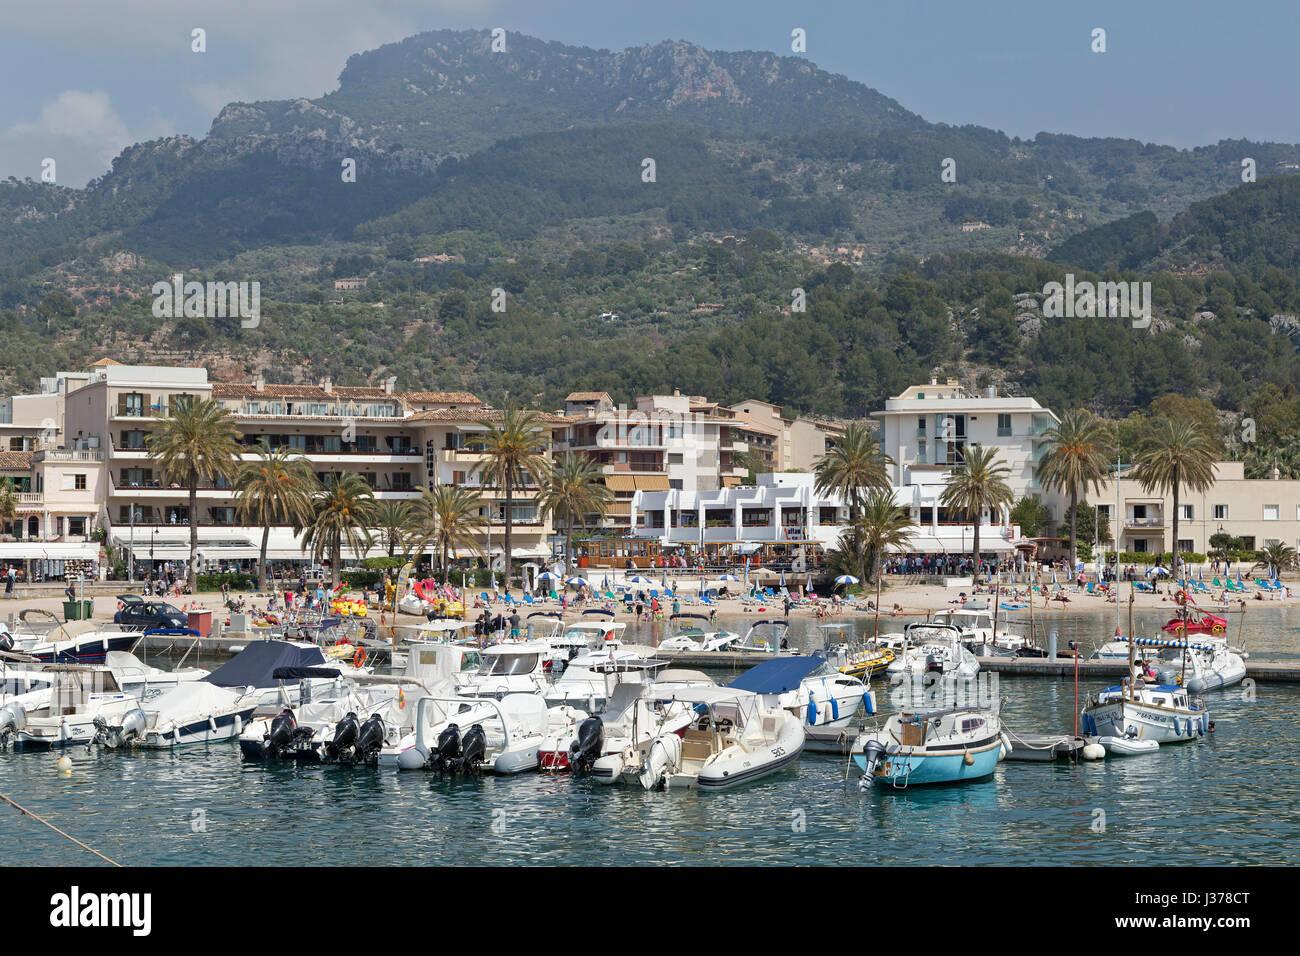 harbour of Port de Sóller, Mallorca, Spain - Stock Image